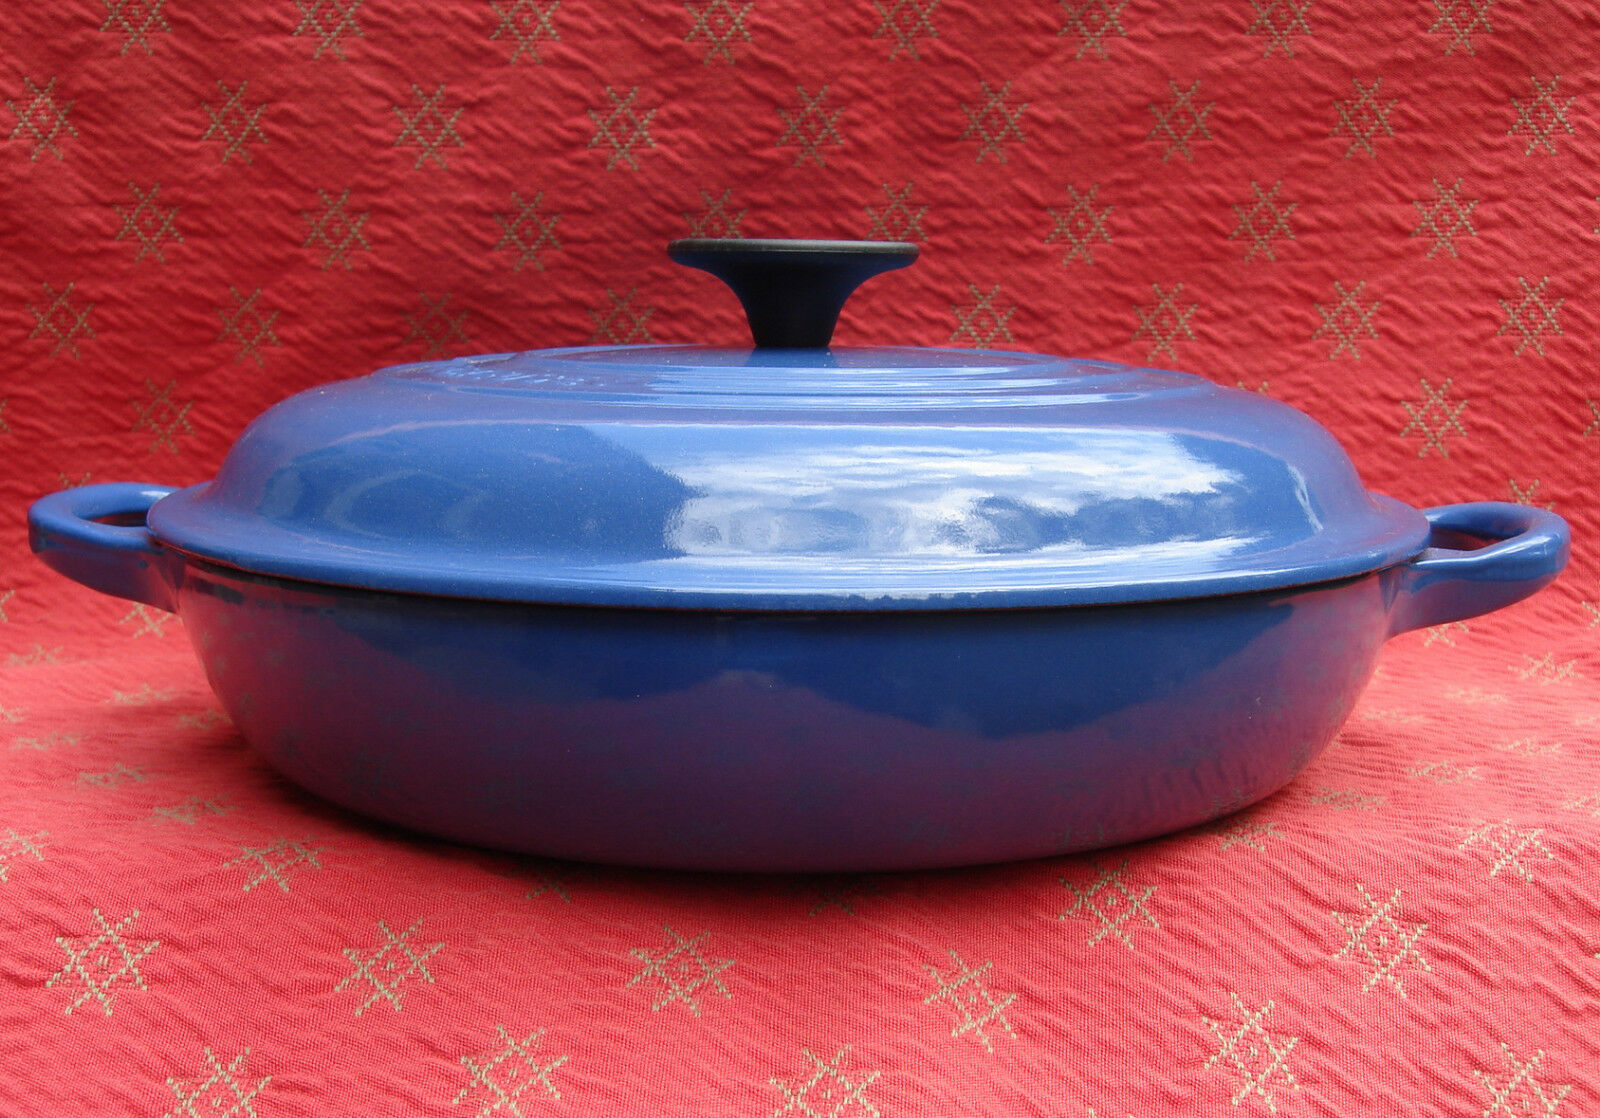 Nuevo En Caja Le Creuset Buffet Cacerola con tapa azul L2532-26 2 1 4 Qt Hecho En Francia